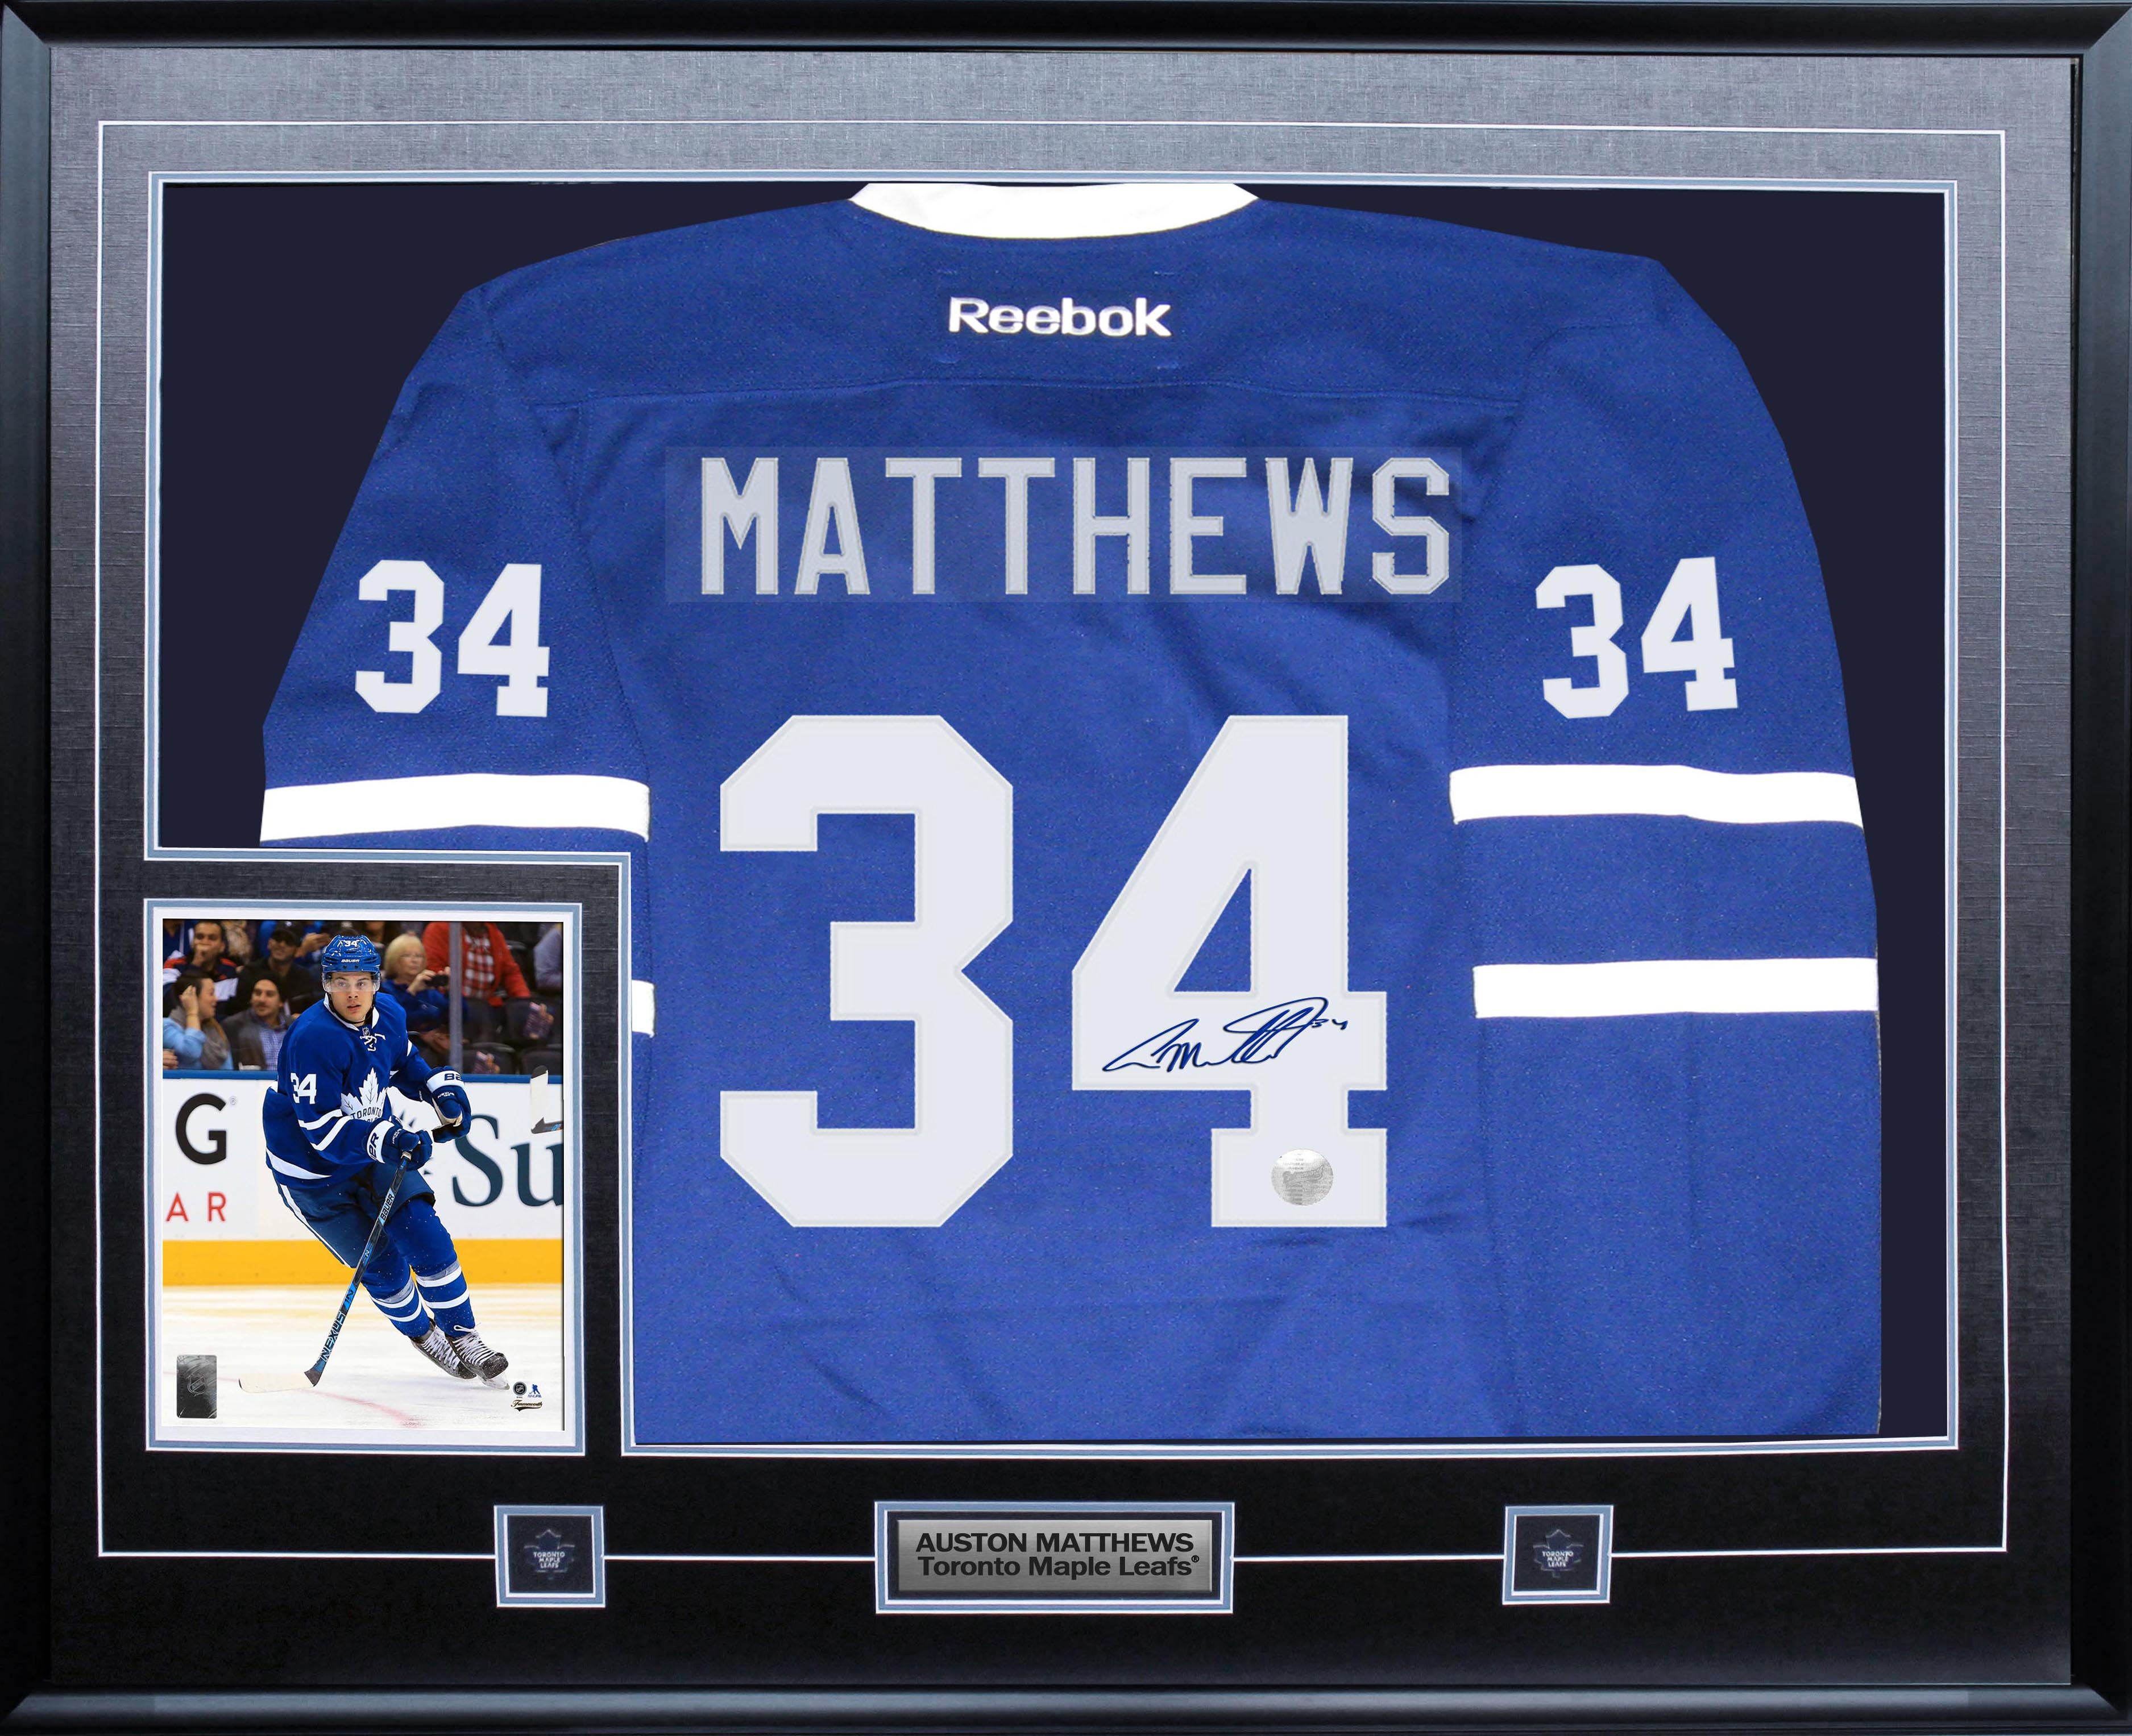 huge selection of 0c76a 238b1 Lot Detail - Auston Matthews - Signed Jersey Framed Toronto ...